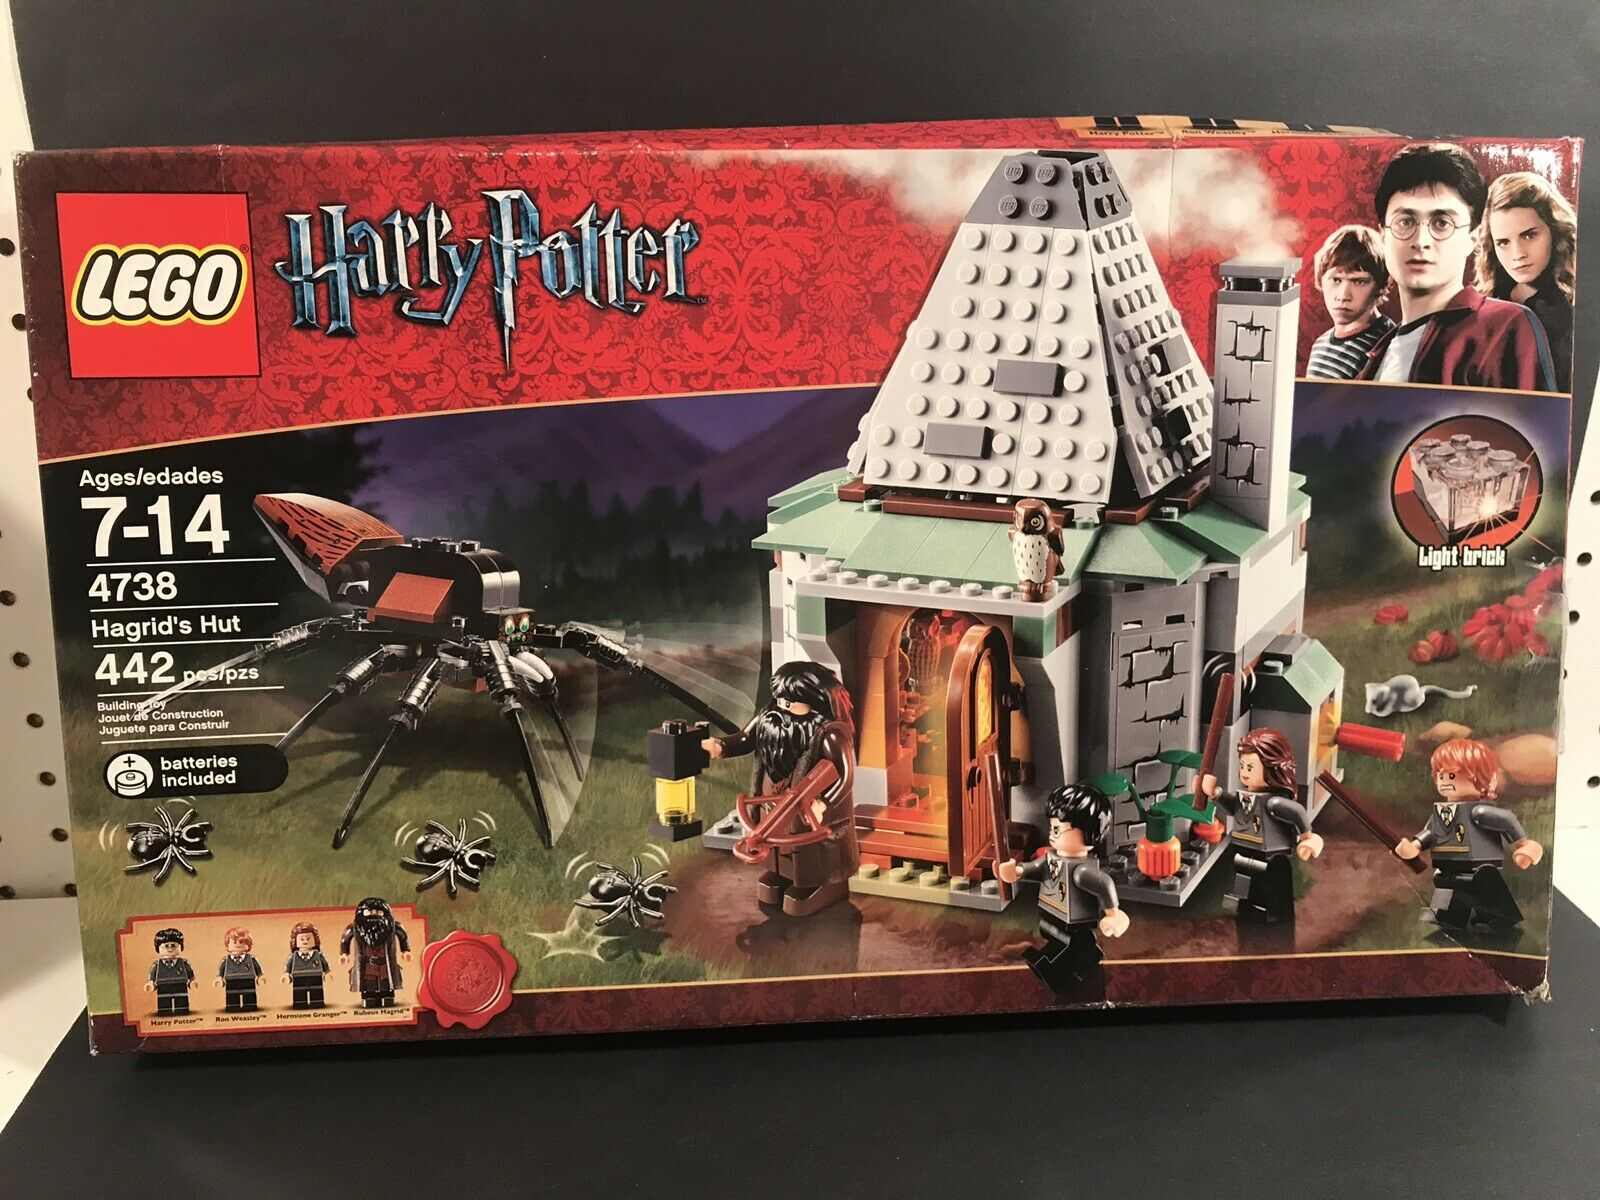 2010 LEGO HARRY POTTER HAGRID'S HUT LEGO SET 4738 WITH BOX VERY RARE RETIrot